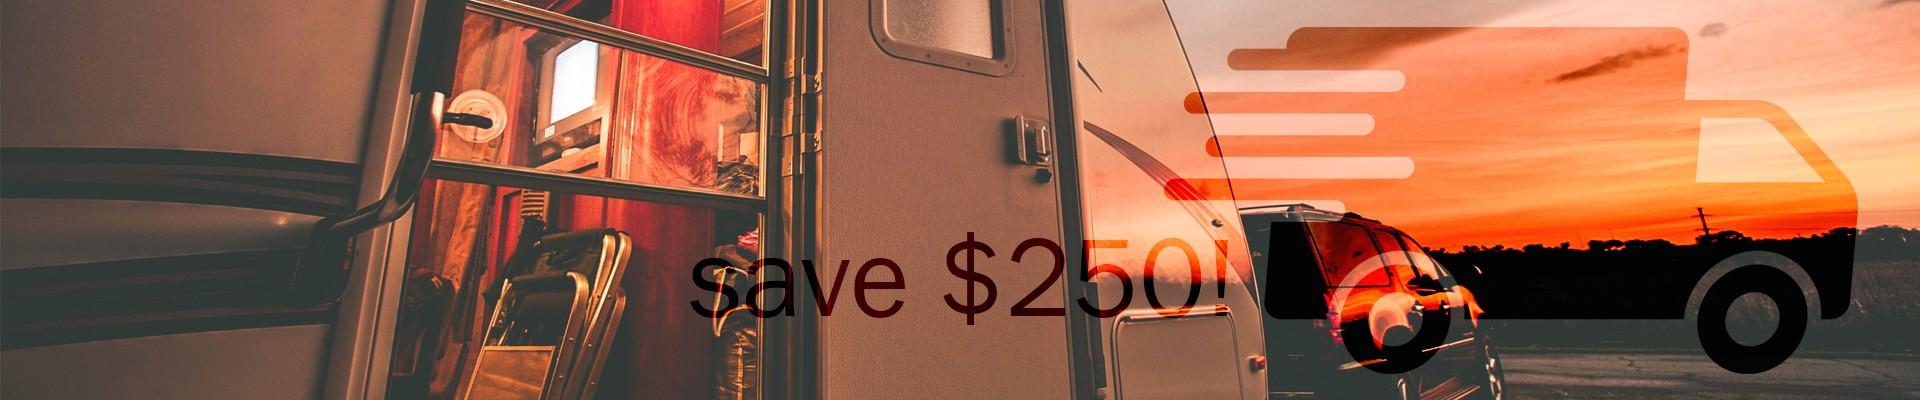 RV Ebay America Beautiful Sale Event savings delivery